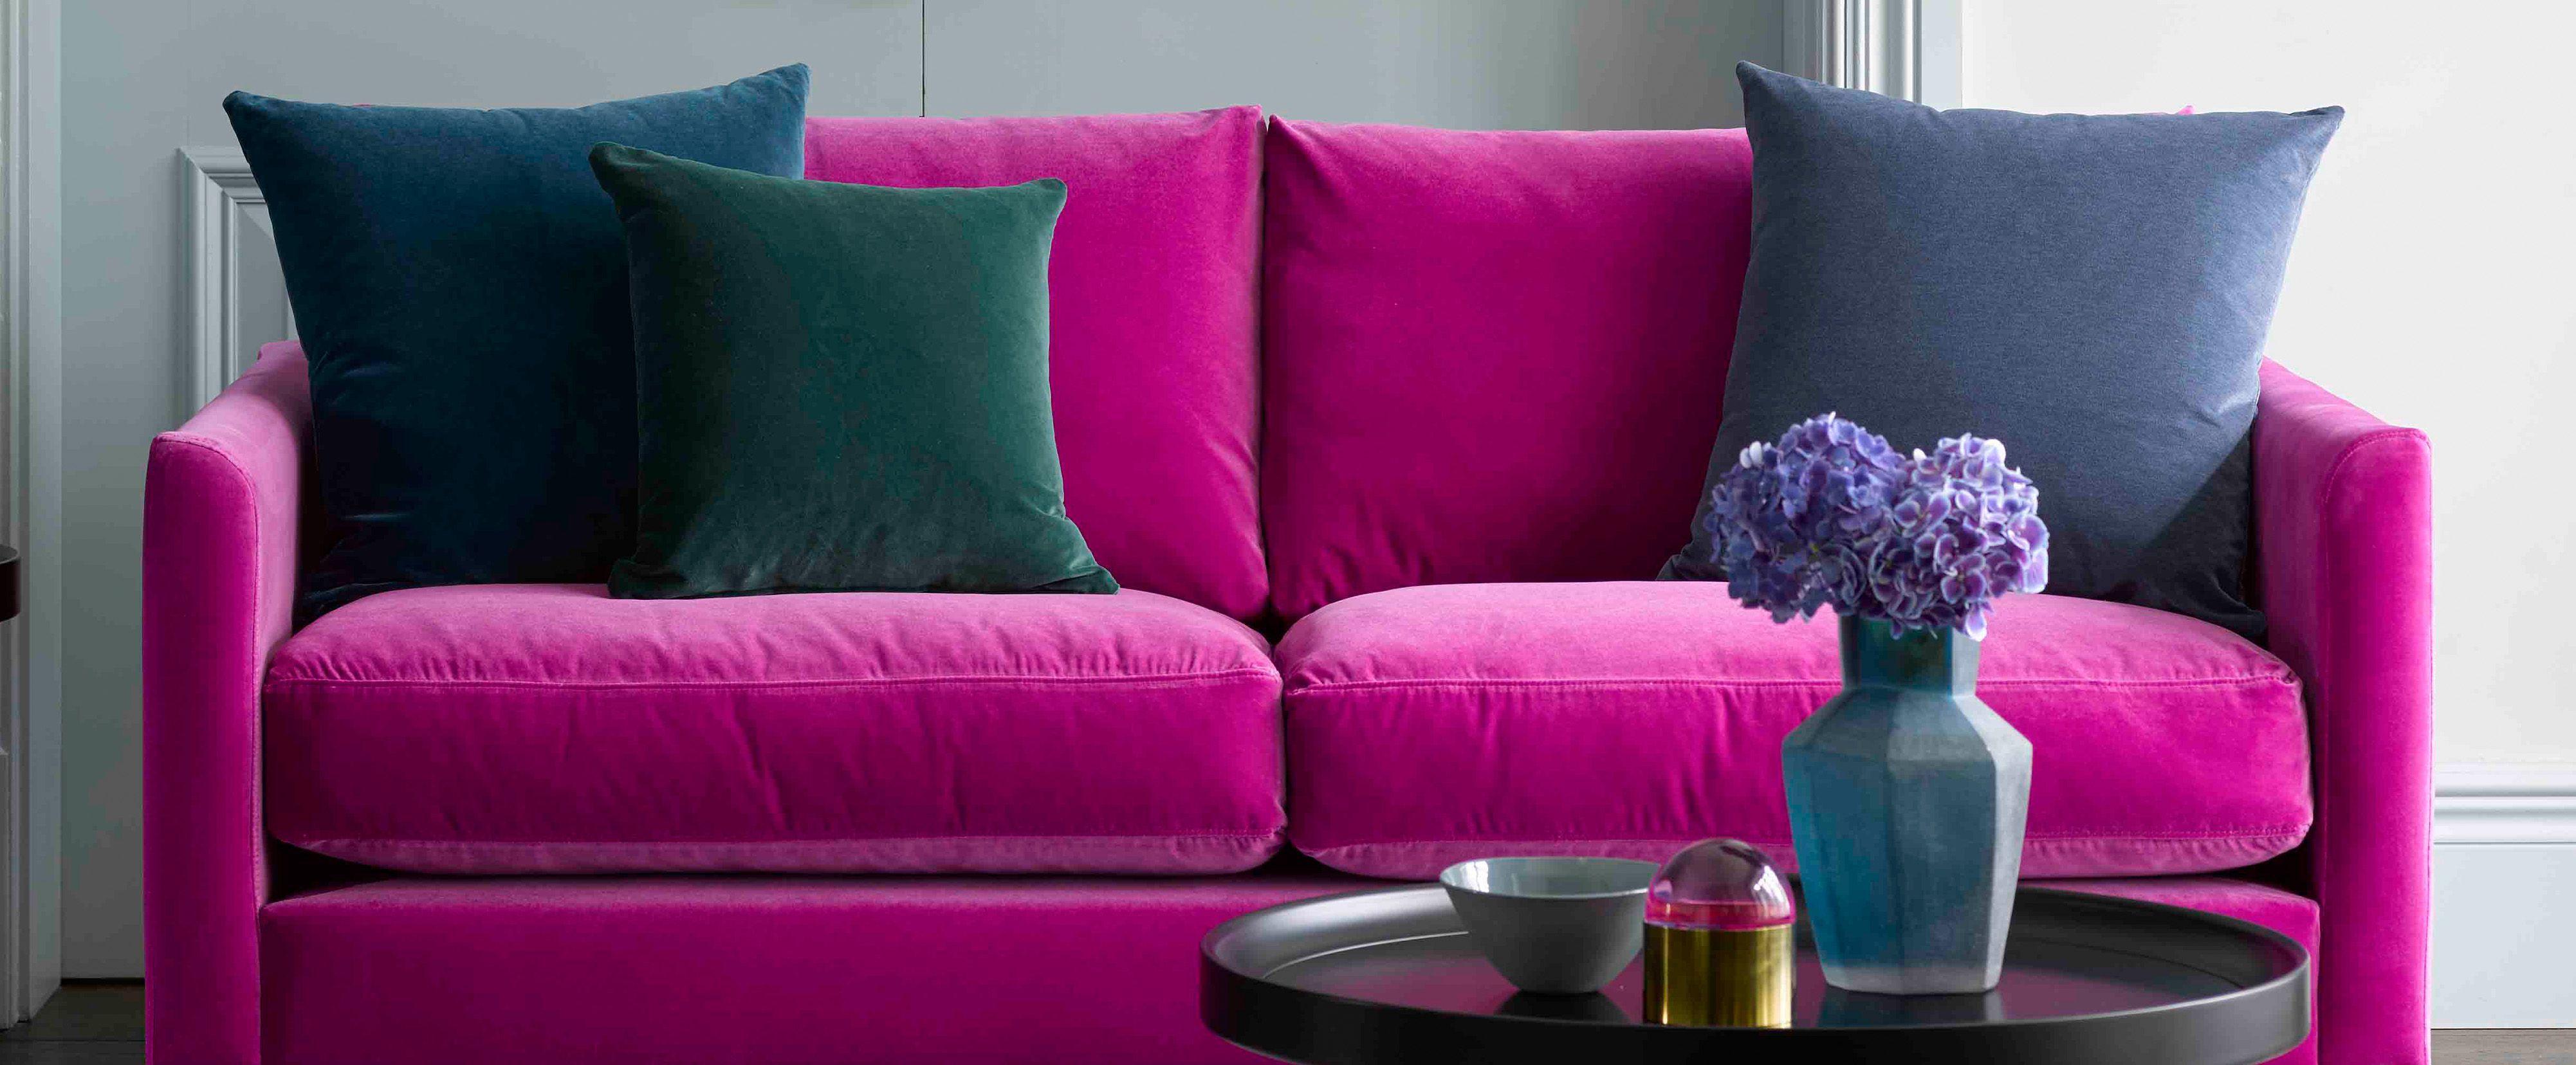 2andhalfseat-sofas.jpg